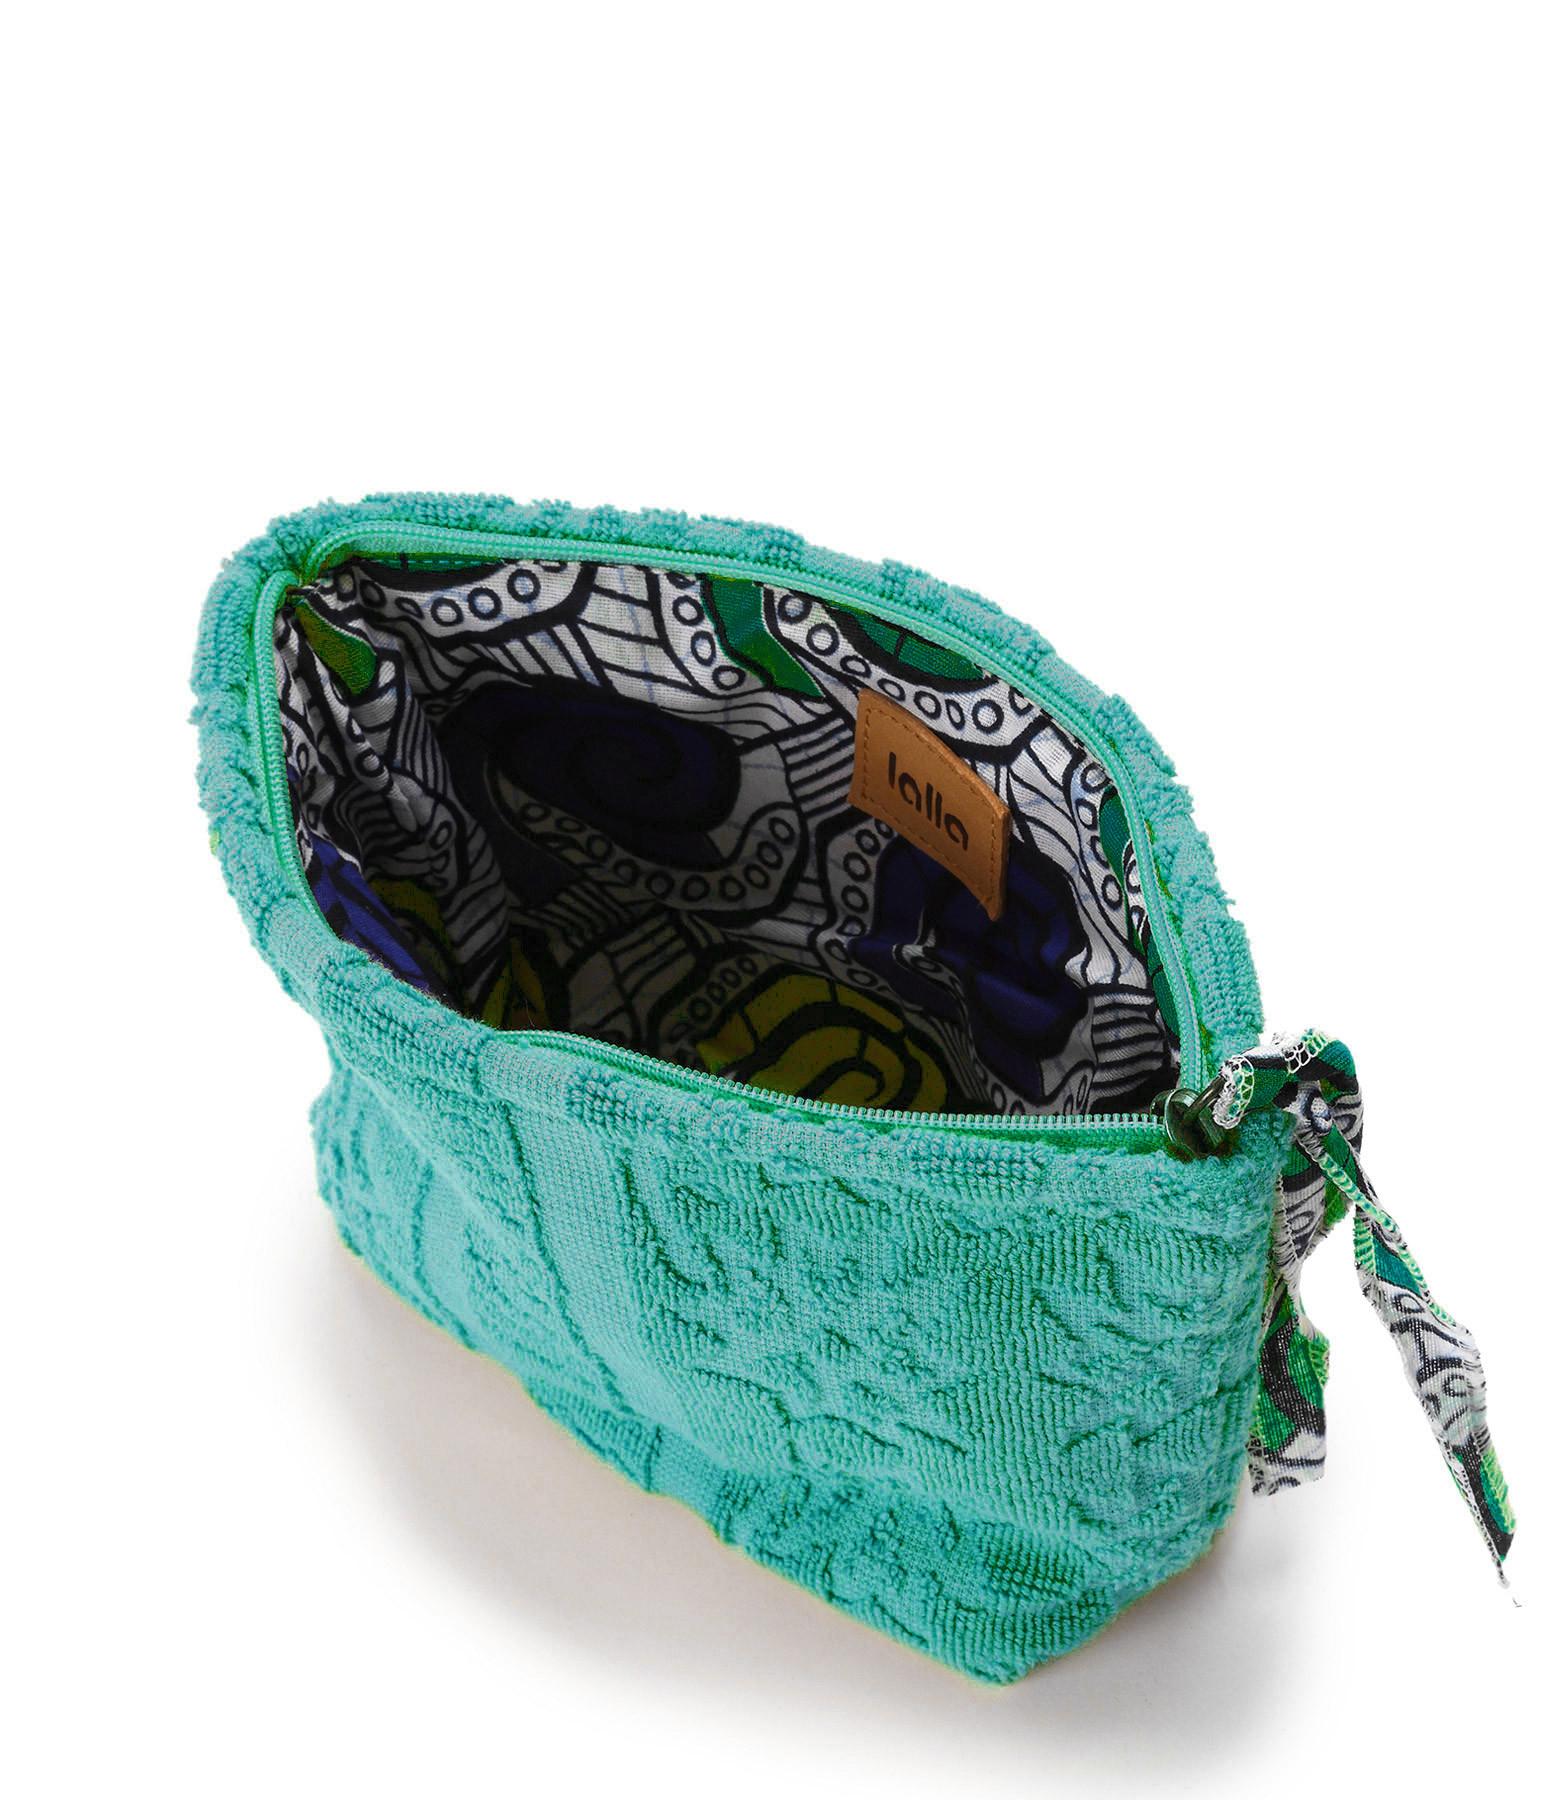 LALLA - Petite Trousse Walakin Eponge Jade